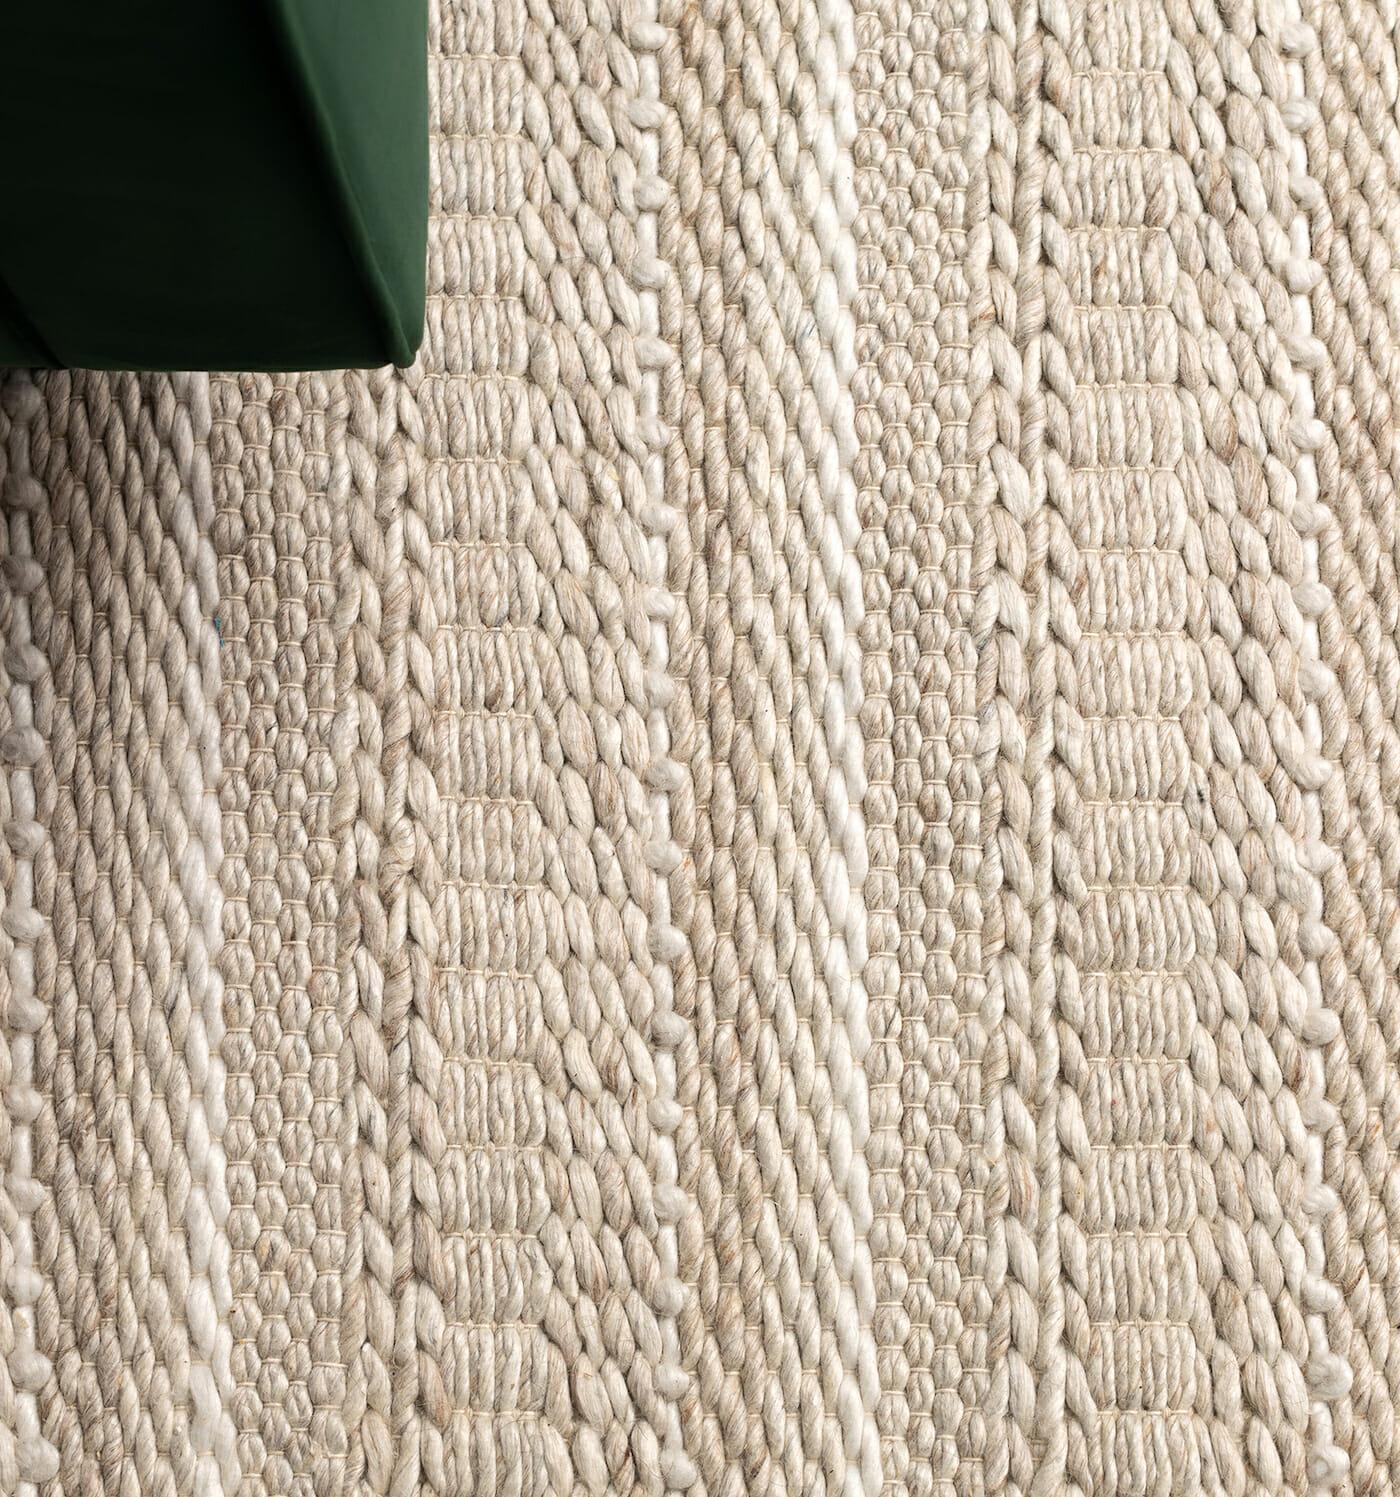 The Sonoma rug